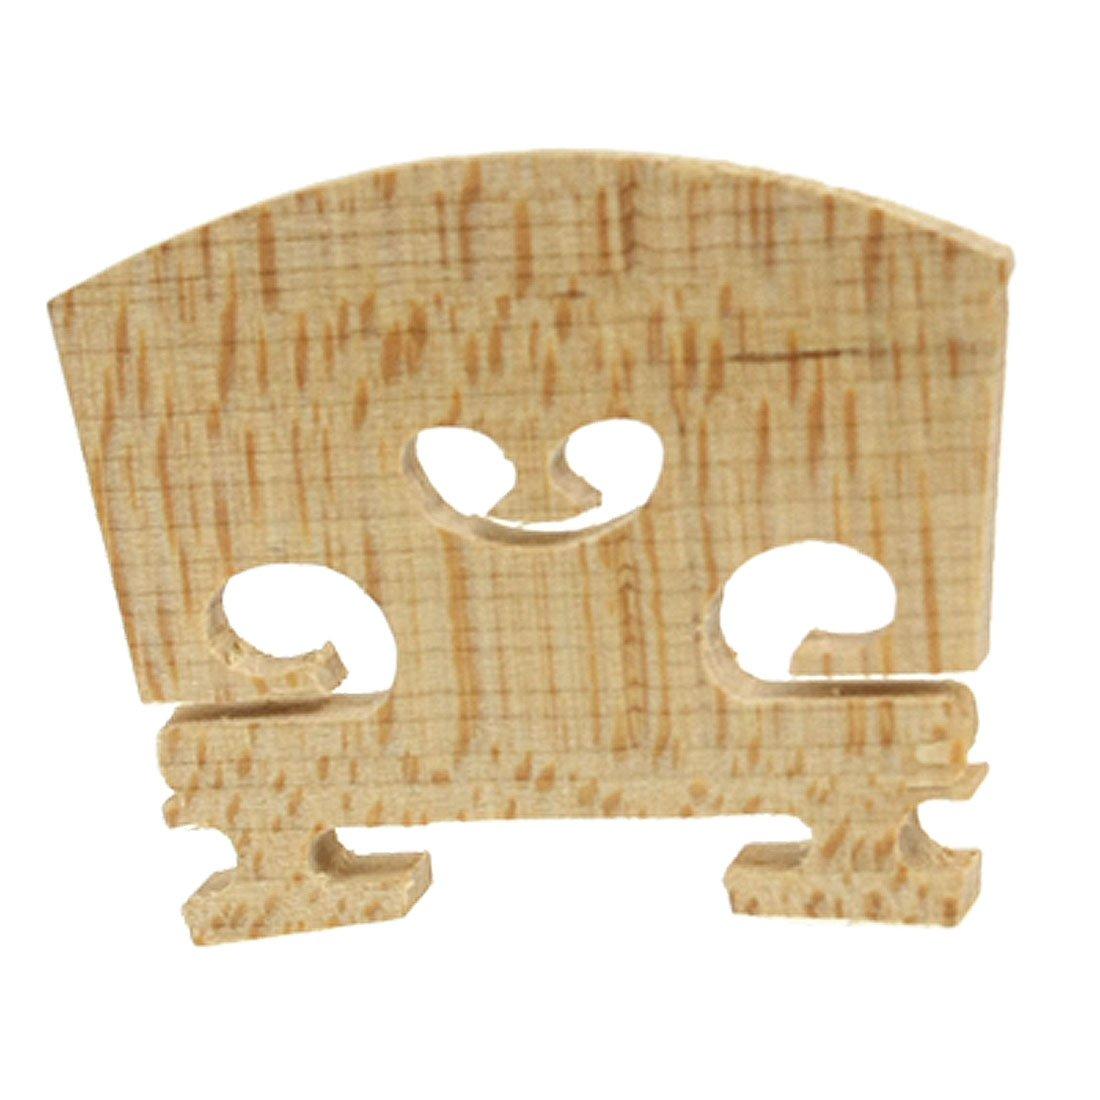 8 Pack Replacement 1/4 Size Violin Parts String Centre Wooden Bridge